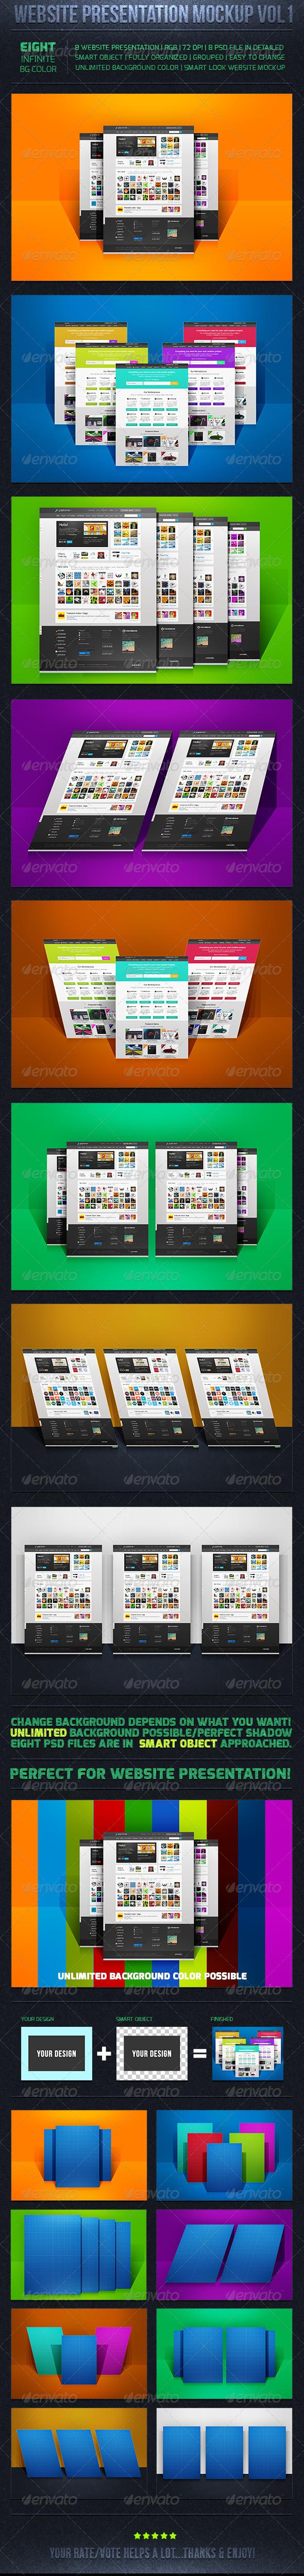 Web Presentation Mockup Vol-1 - Website Displays